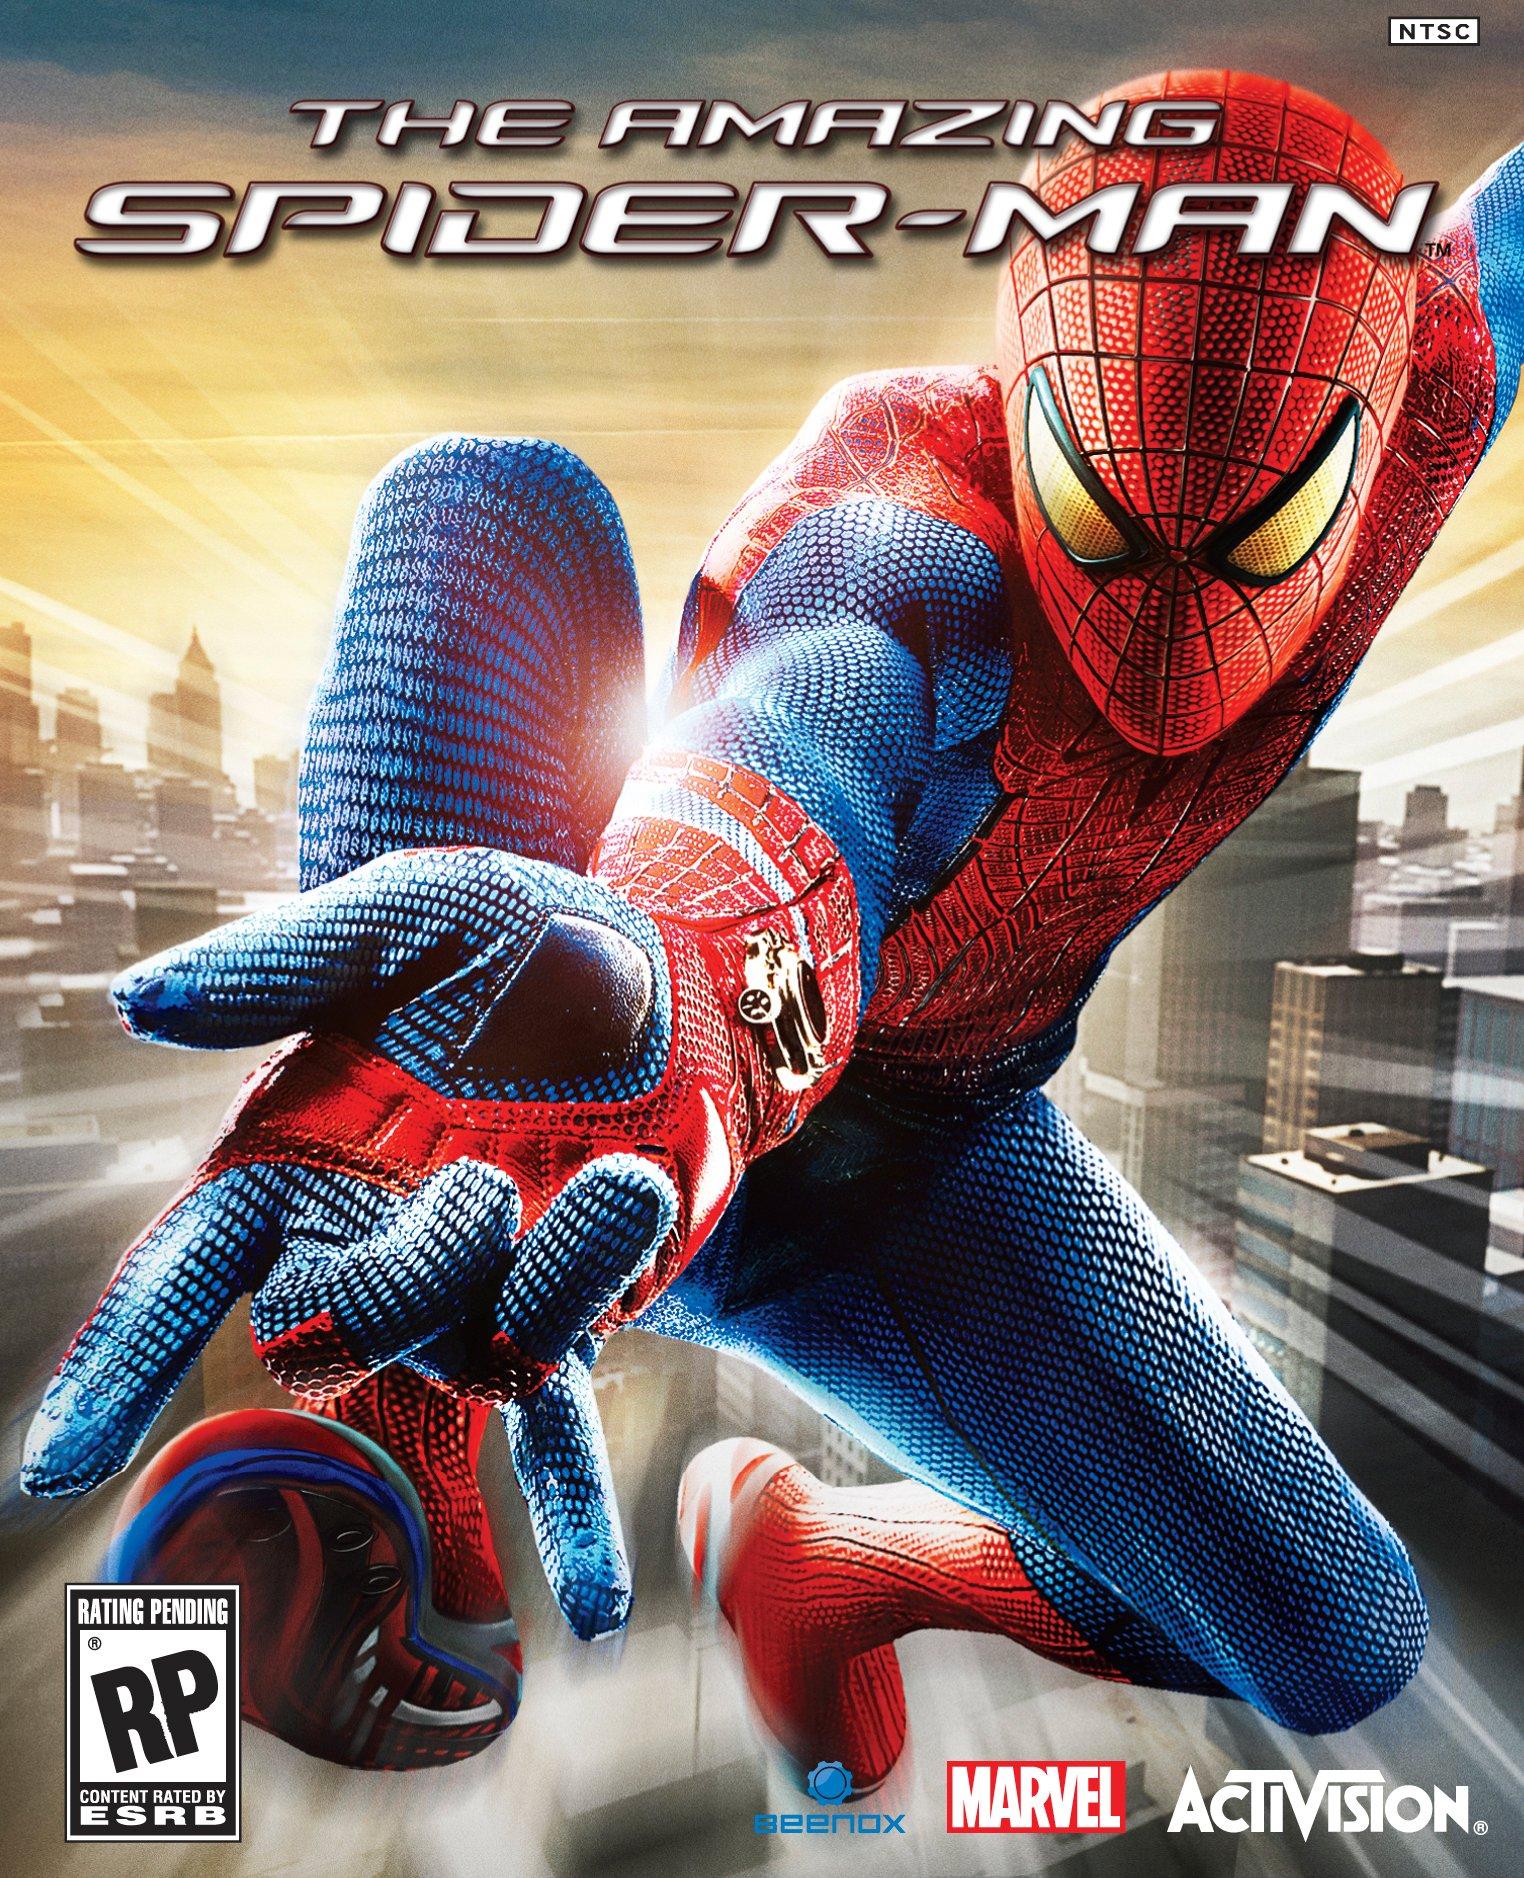 The amazing spider man 3 full movie free watch